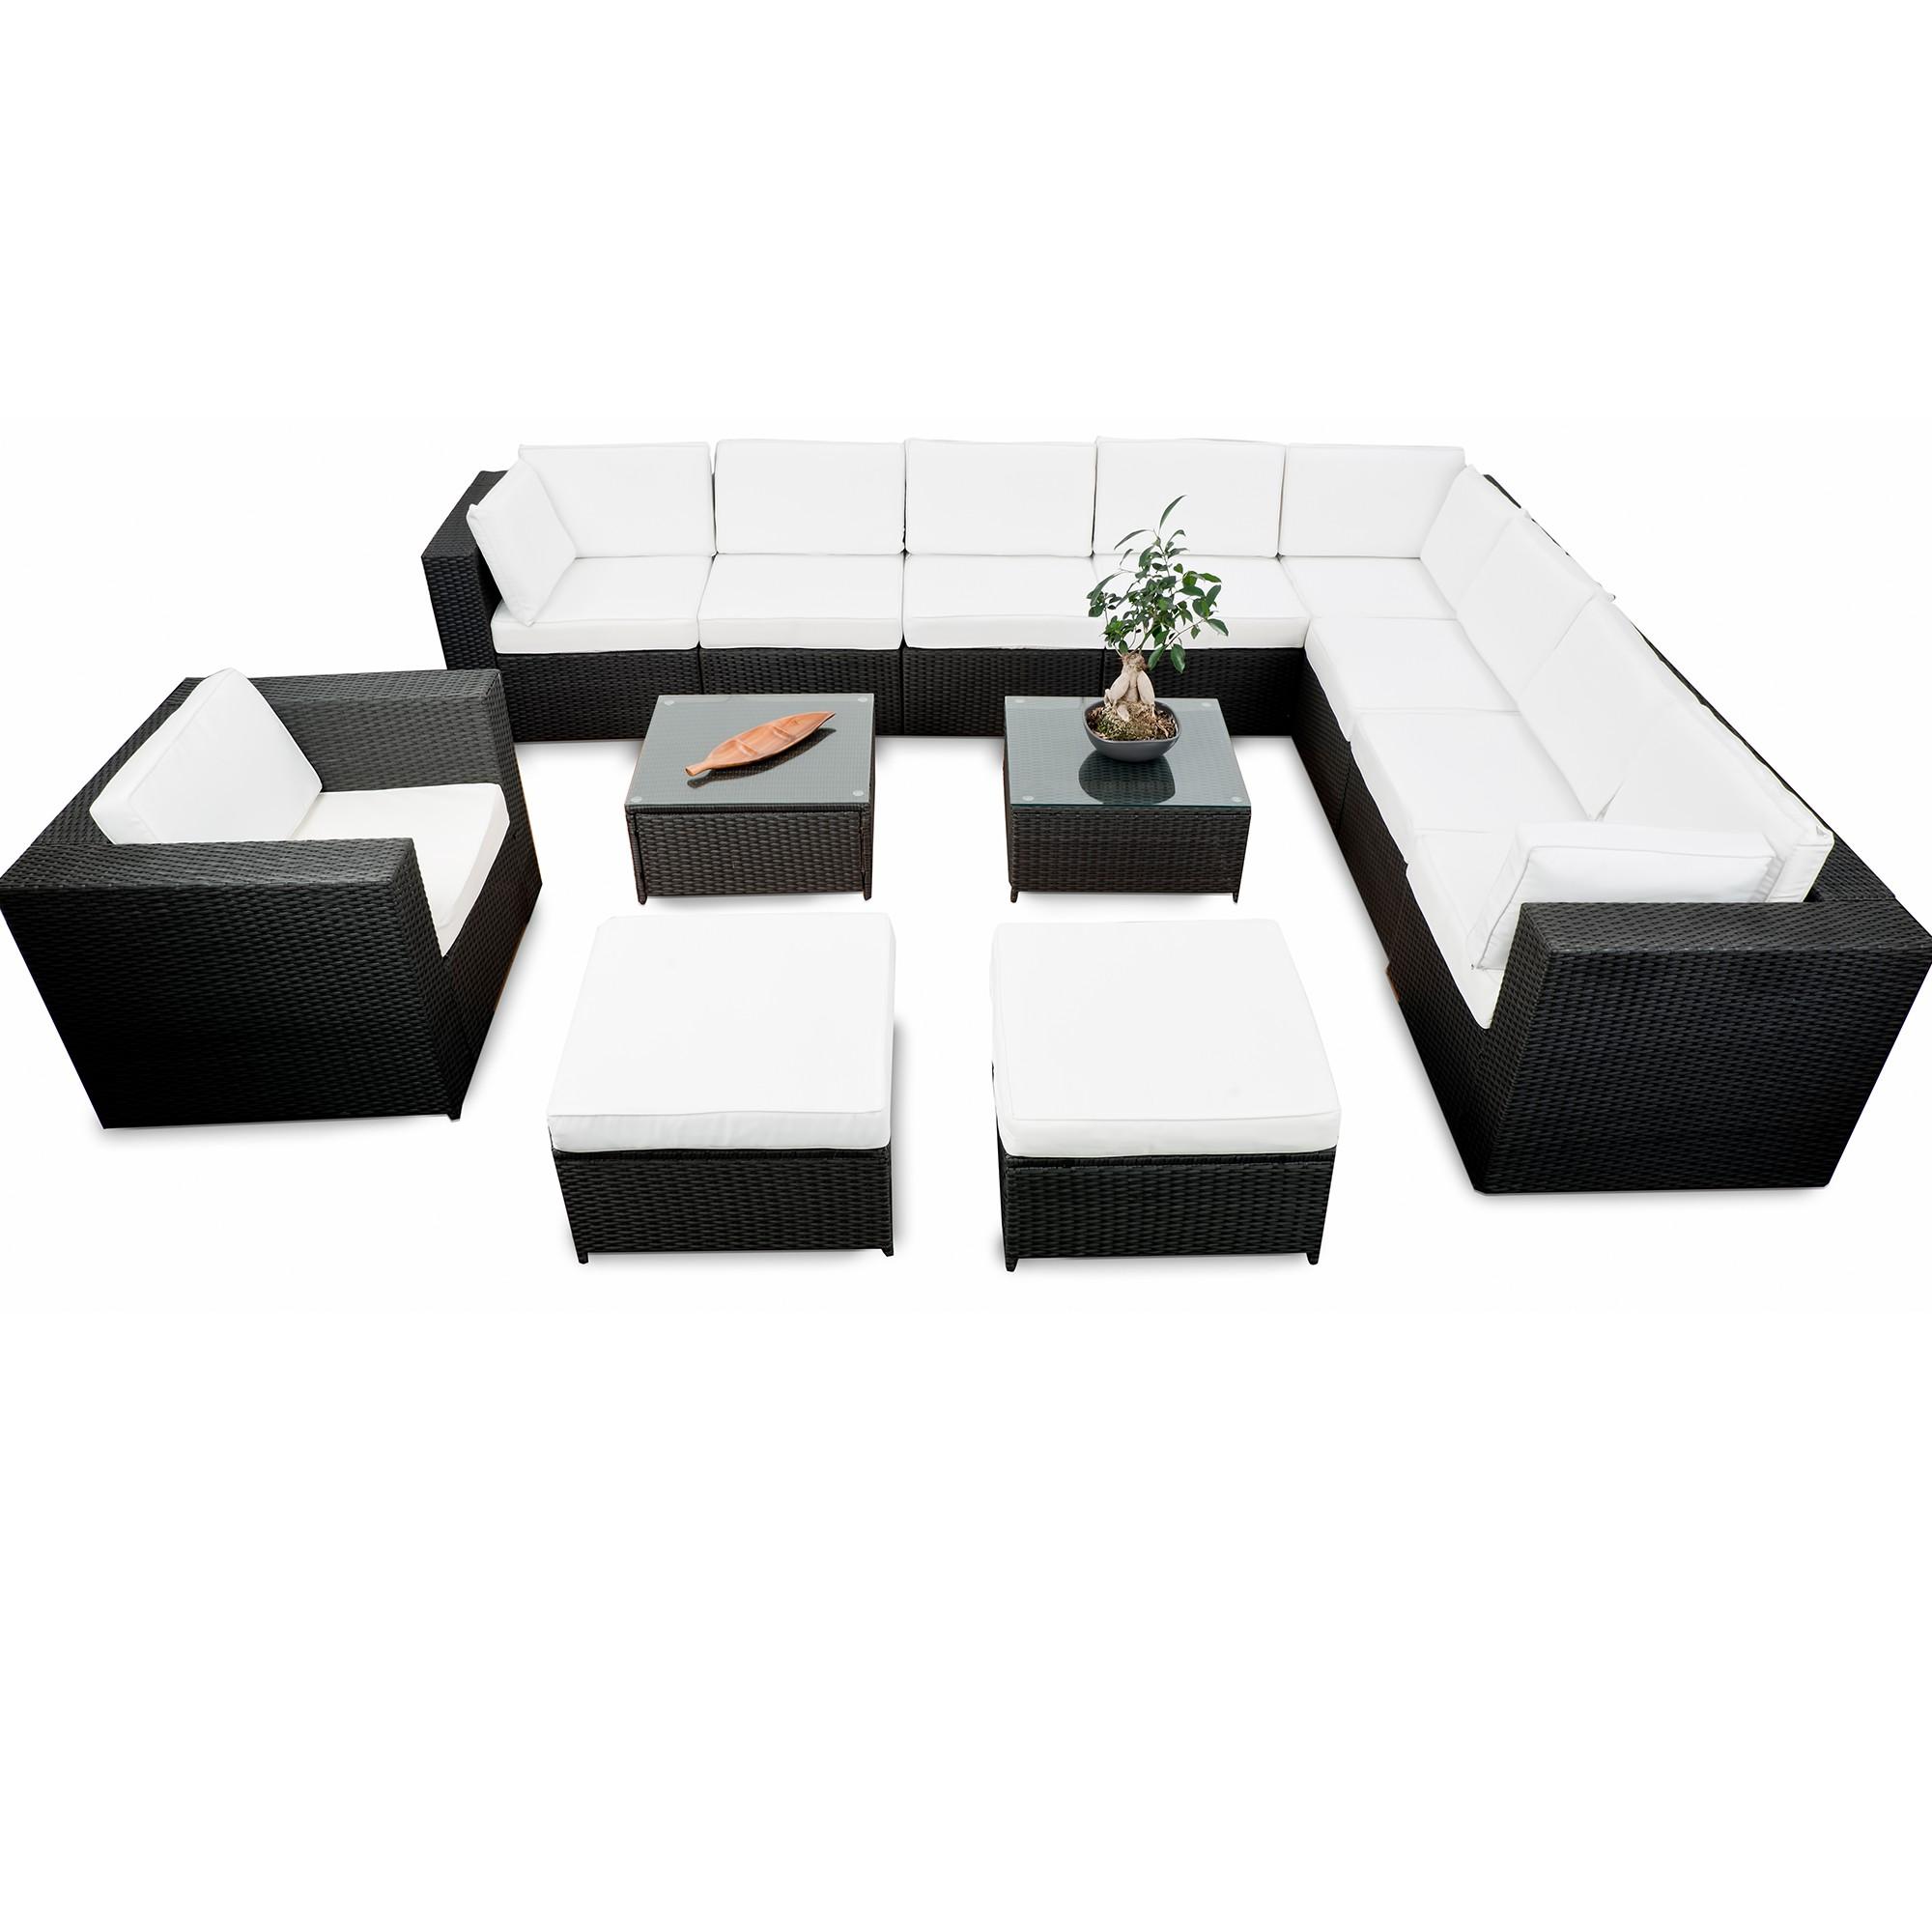 Gartenmoebel Rattan Lounge ▻ günstig ◅ Rattan Lounge Gartenmöbel ...